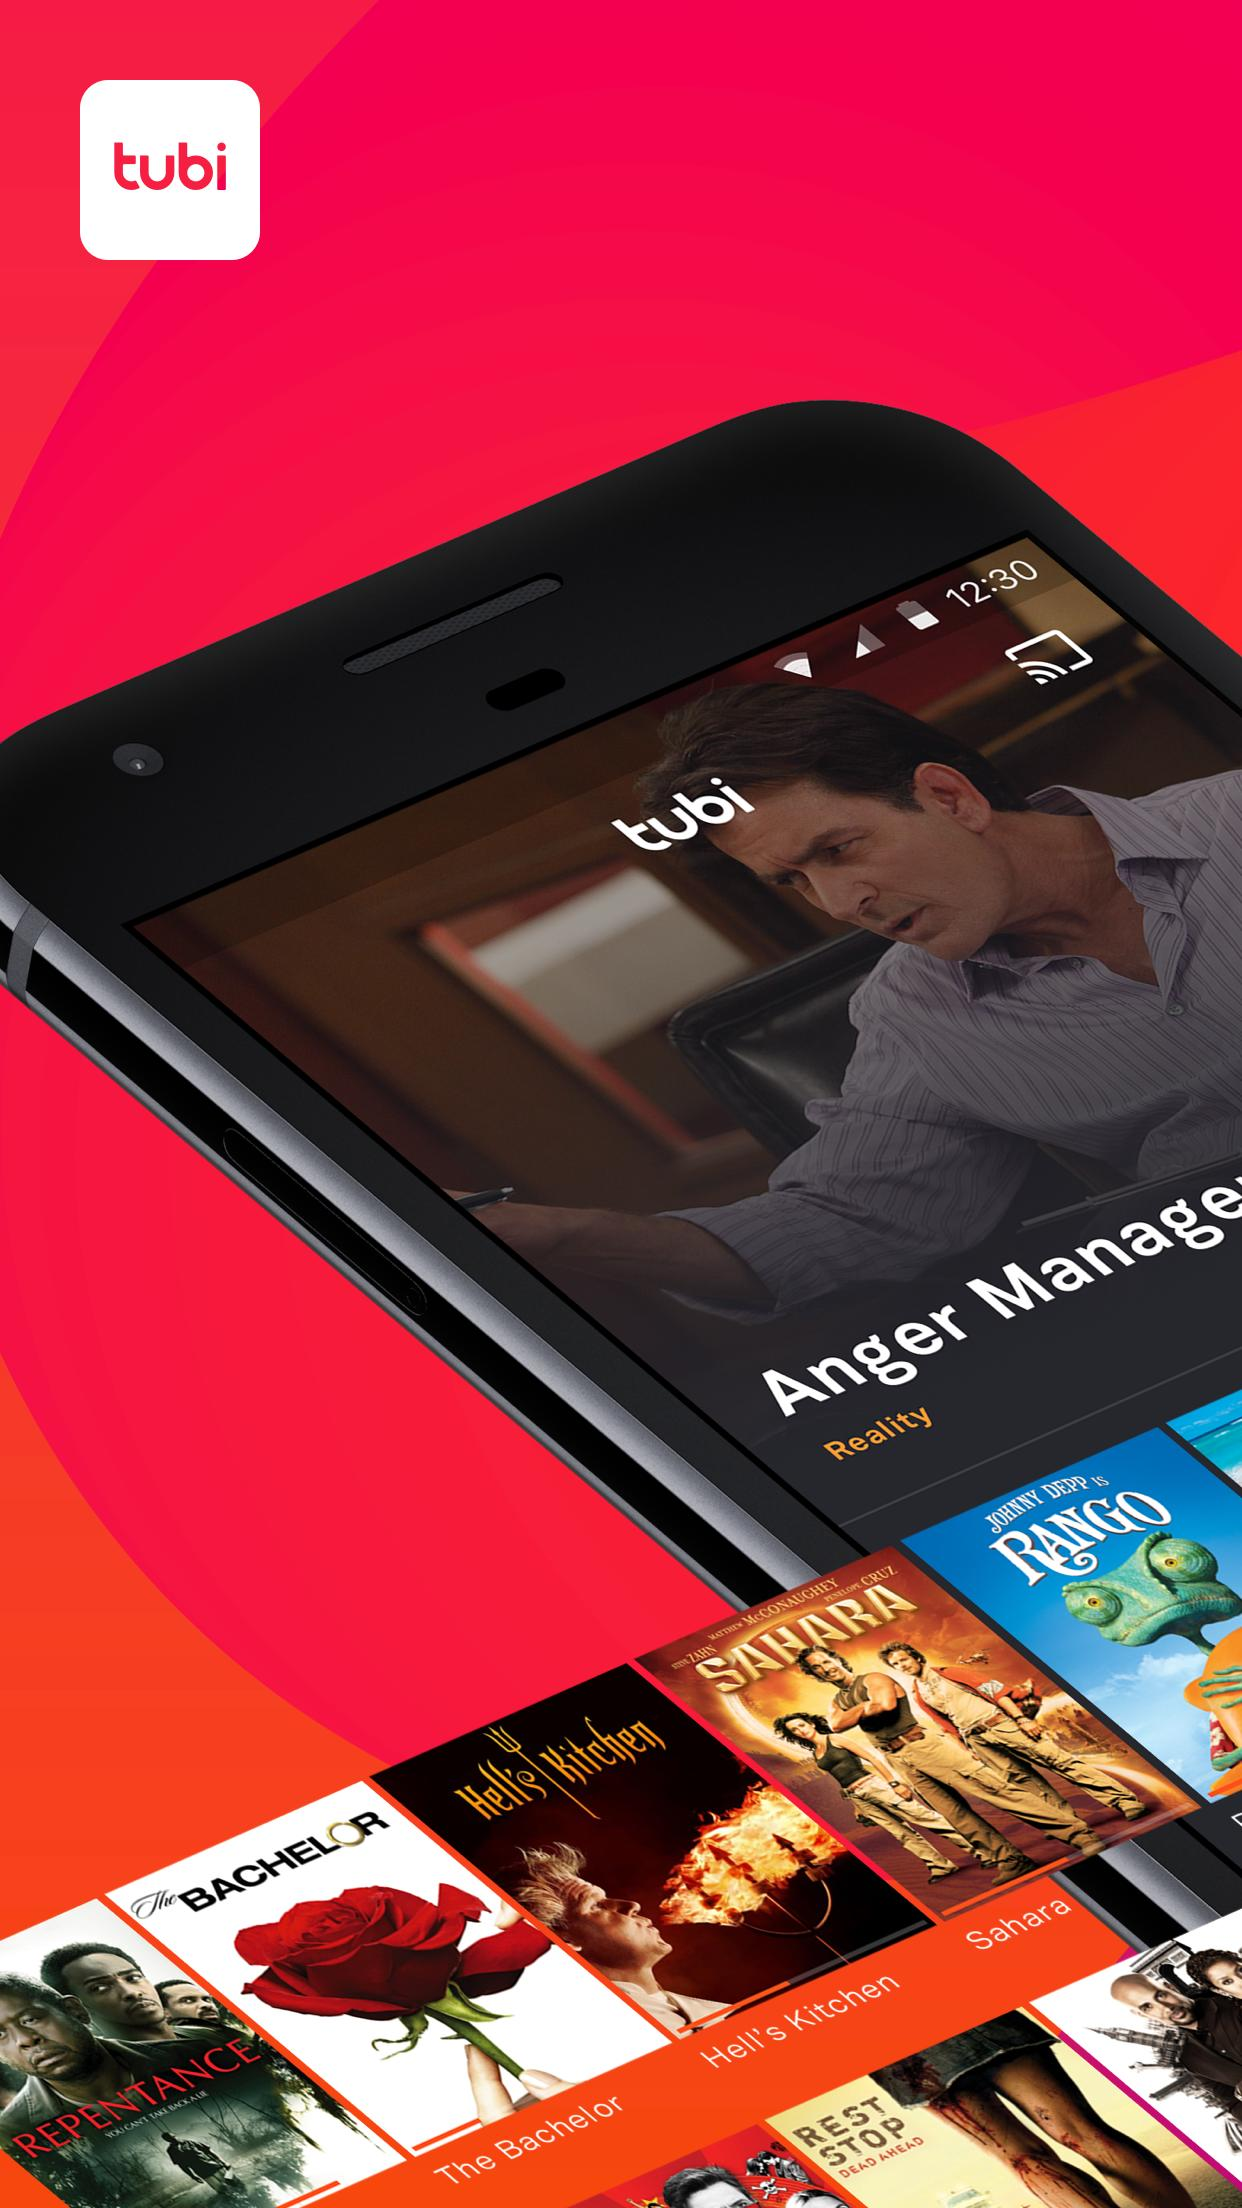 Tubi - Free Movies & TV Shows 4.7.4 Screenshot 1